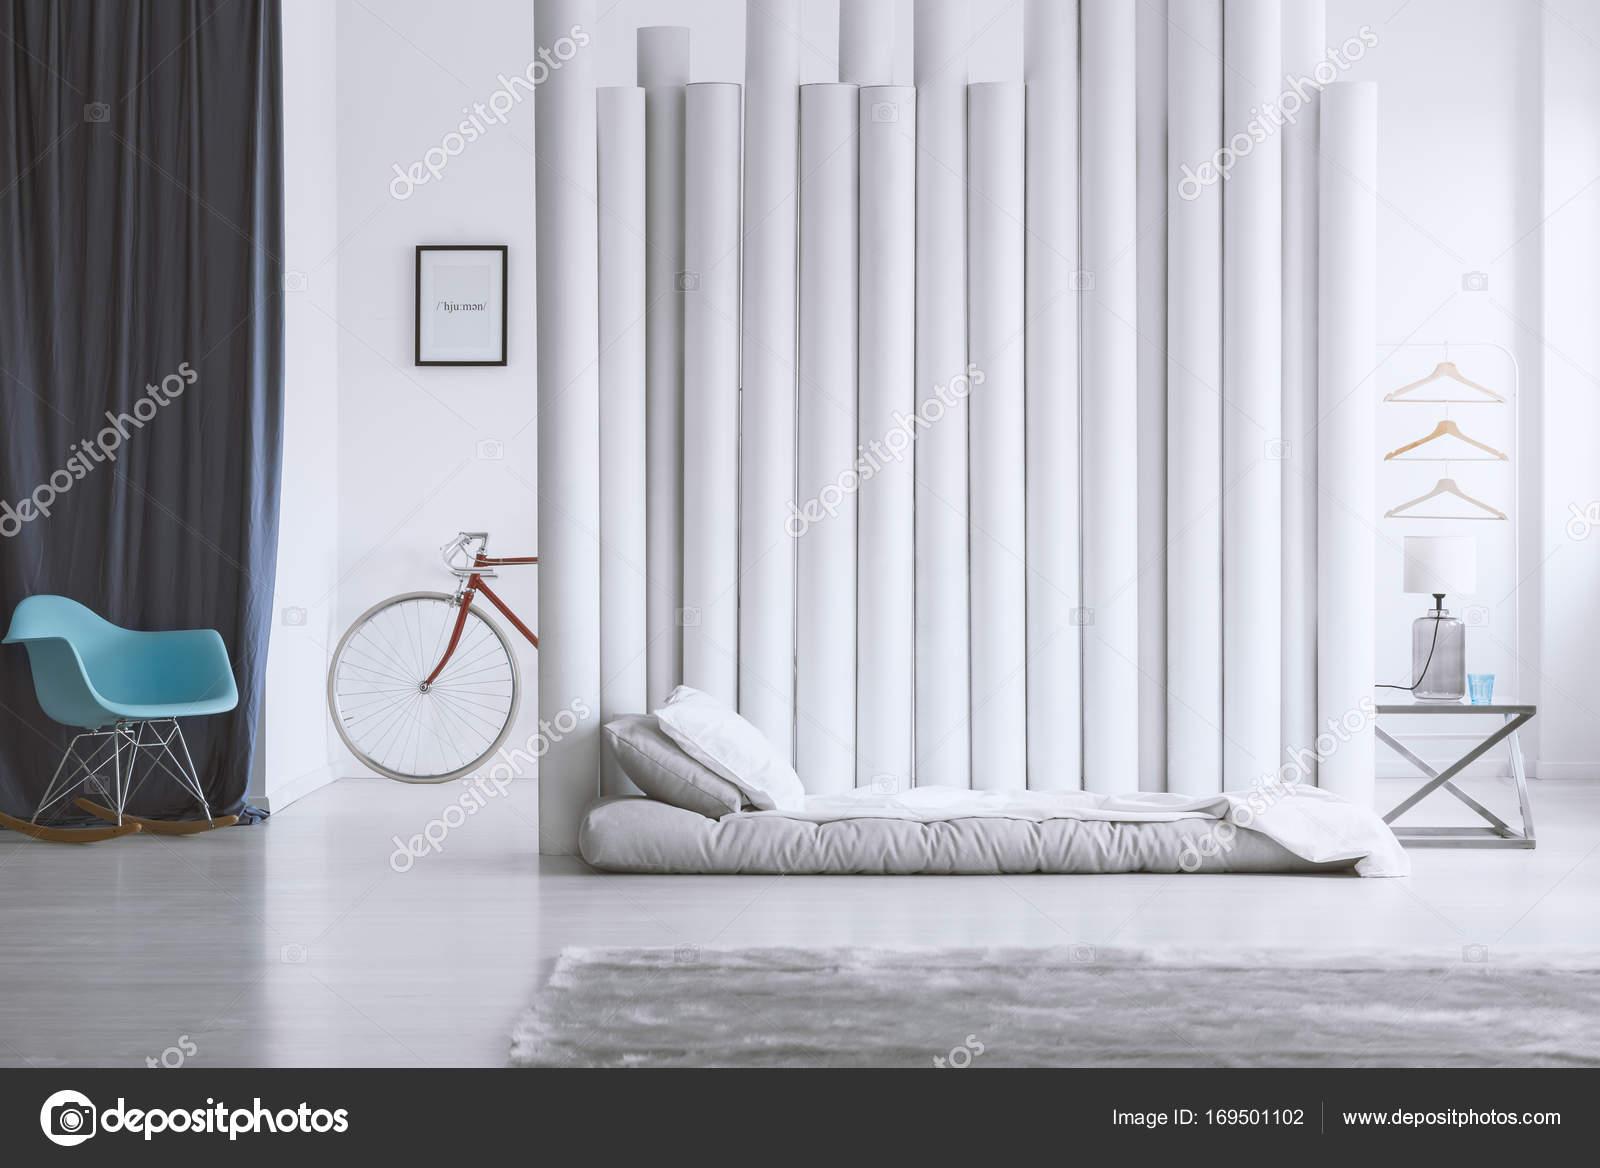 Divisor de cama y tubo gris — Foto de stock © photographee.eu #169501102